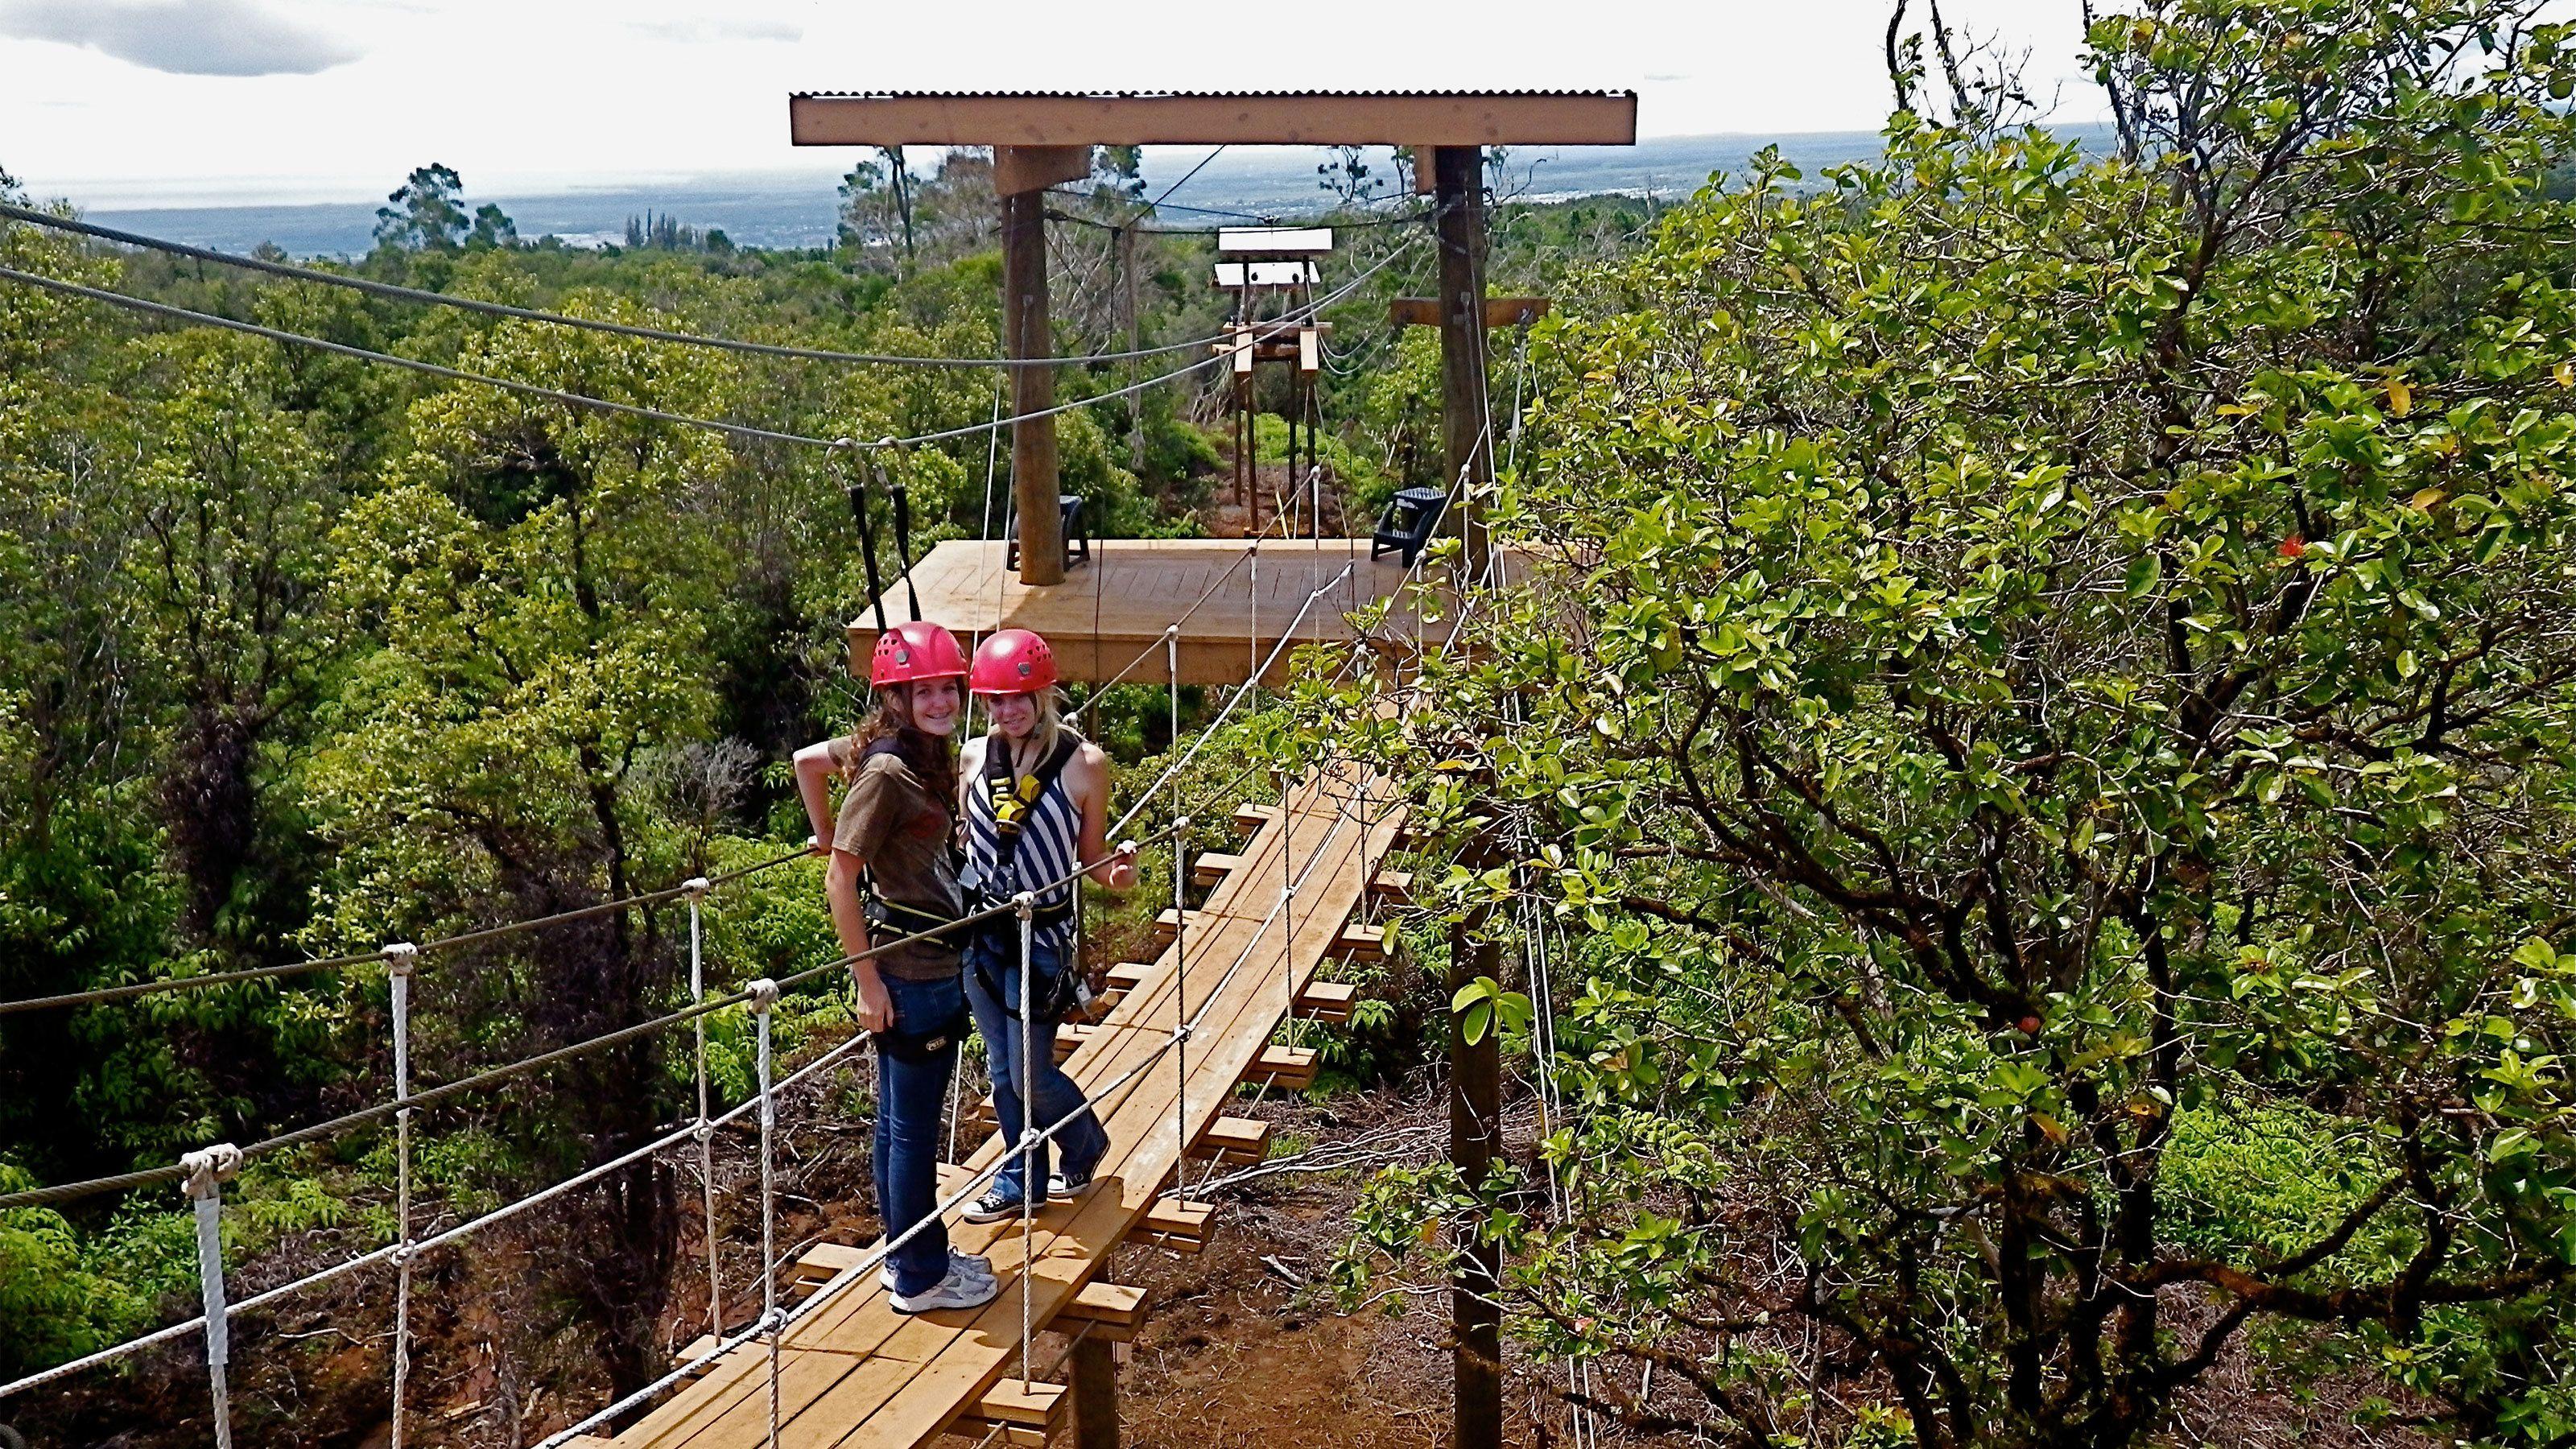 Two women on an zip line bridge in a canopy of a Hawaiian forest